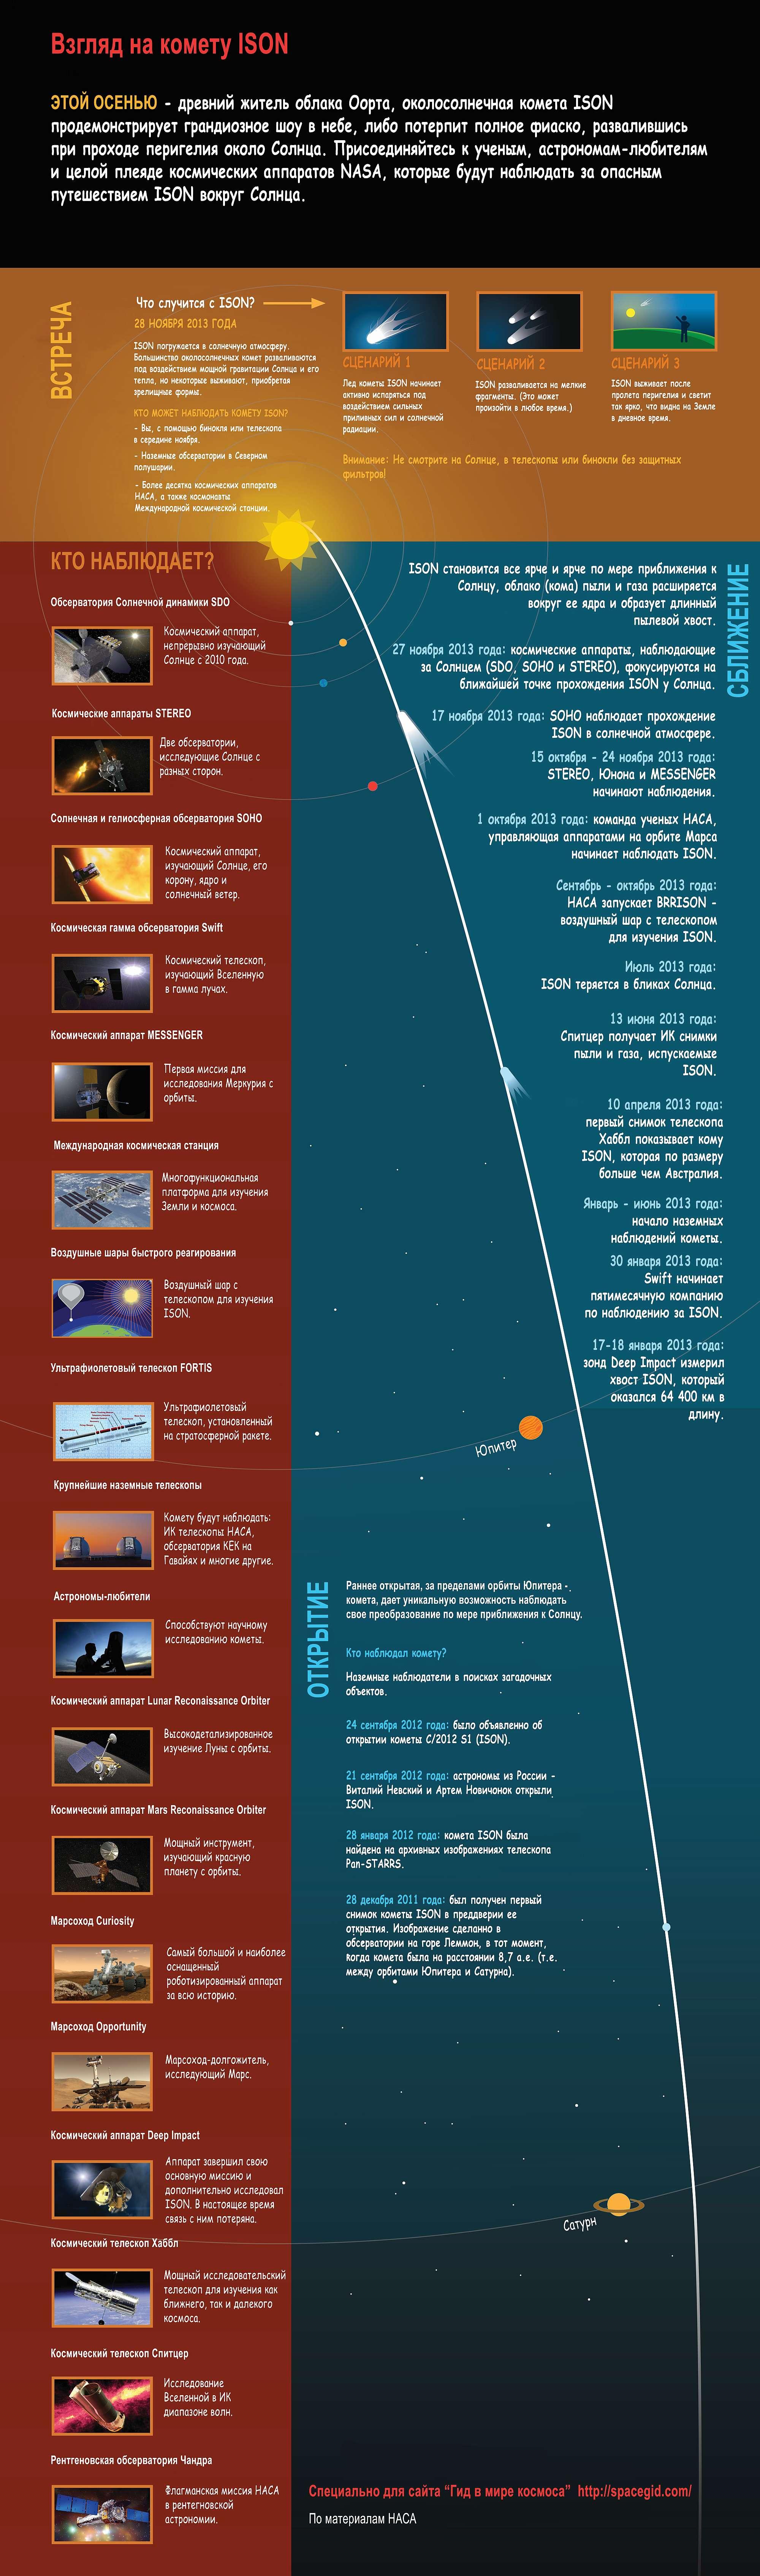 Хронология кометы ISON